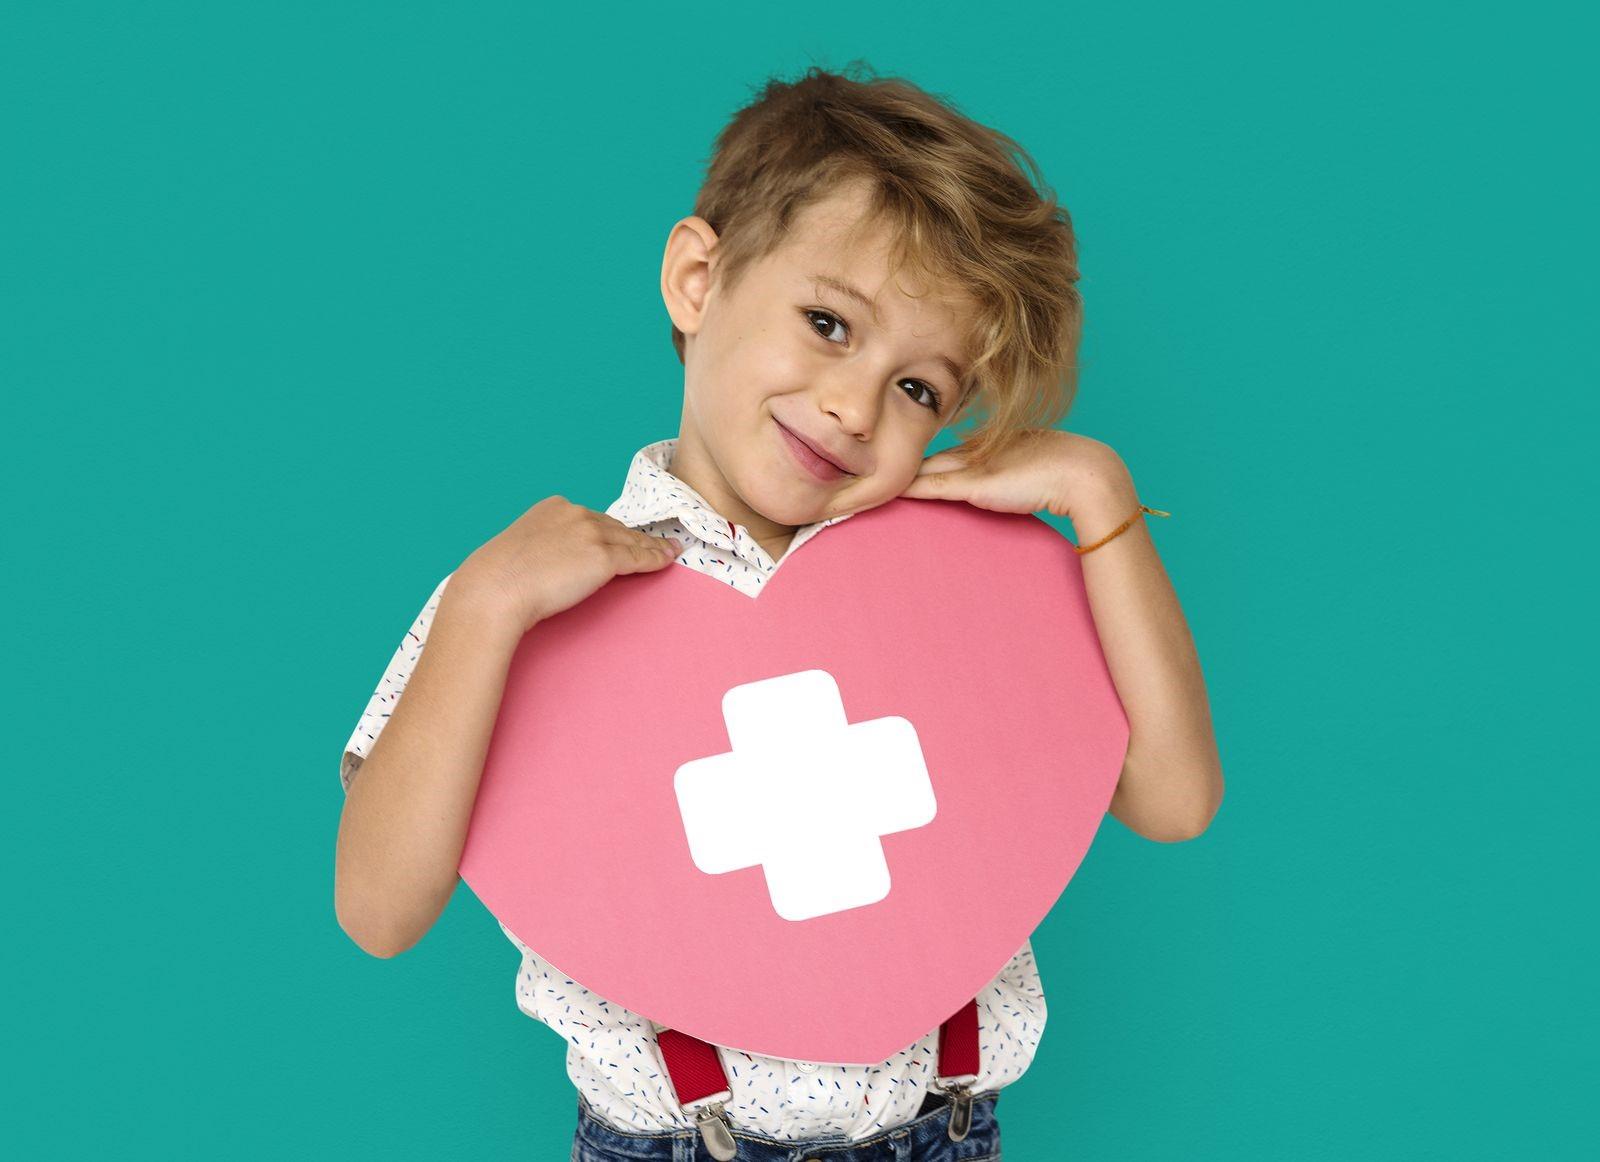 Pediatric First Aid Course